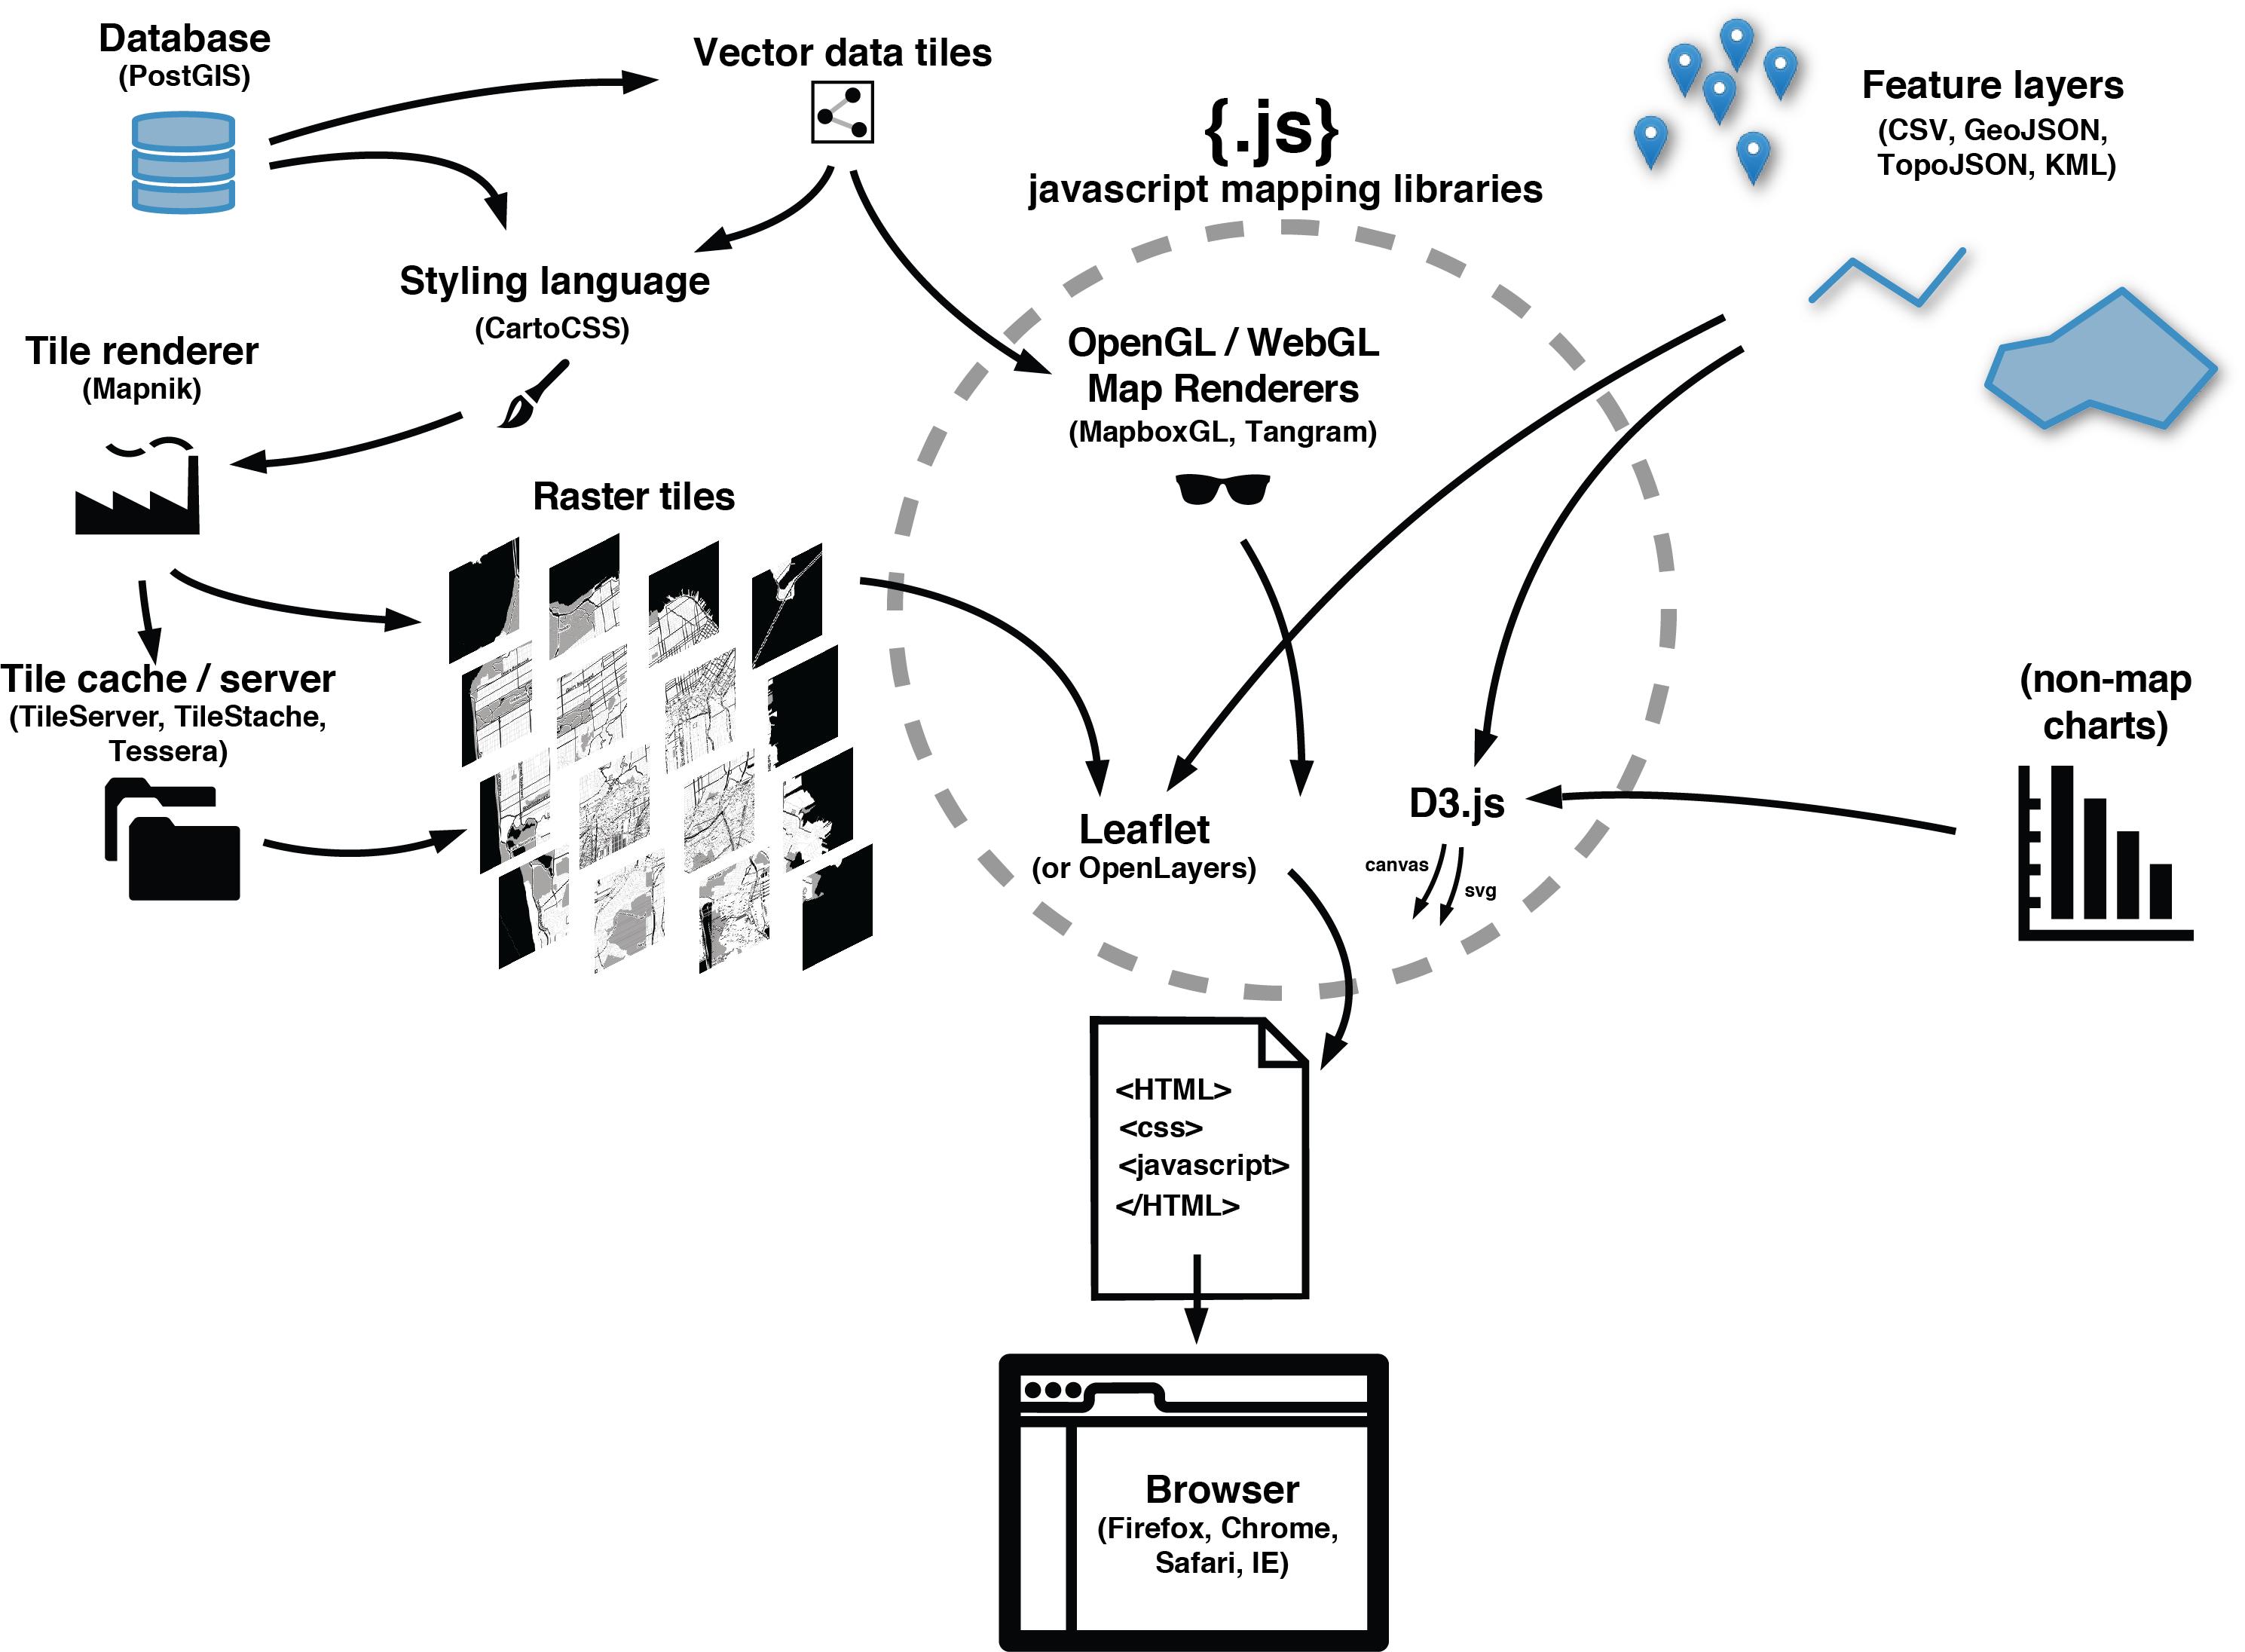 GitHub - stamen/spatial-dataviz-for-data-scientists: Spatial Data